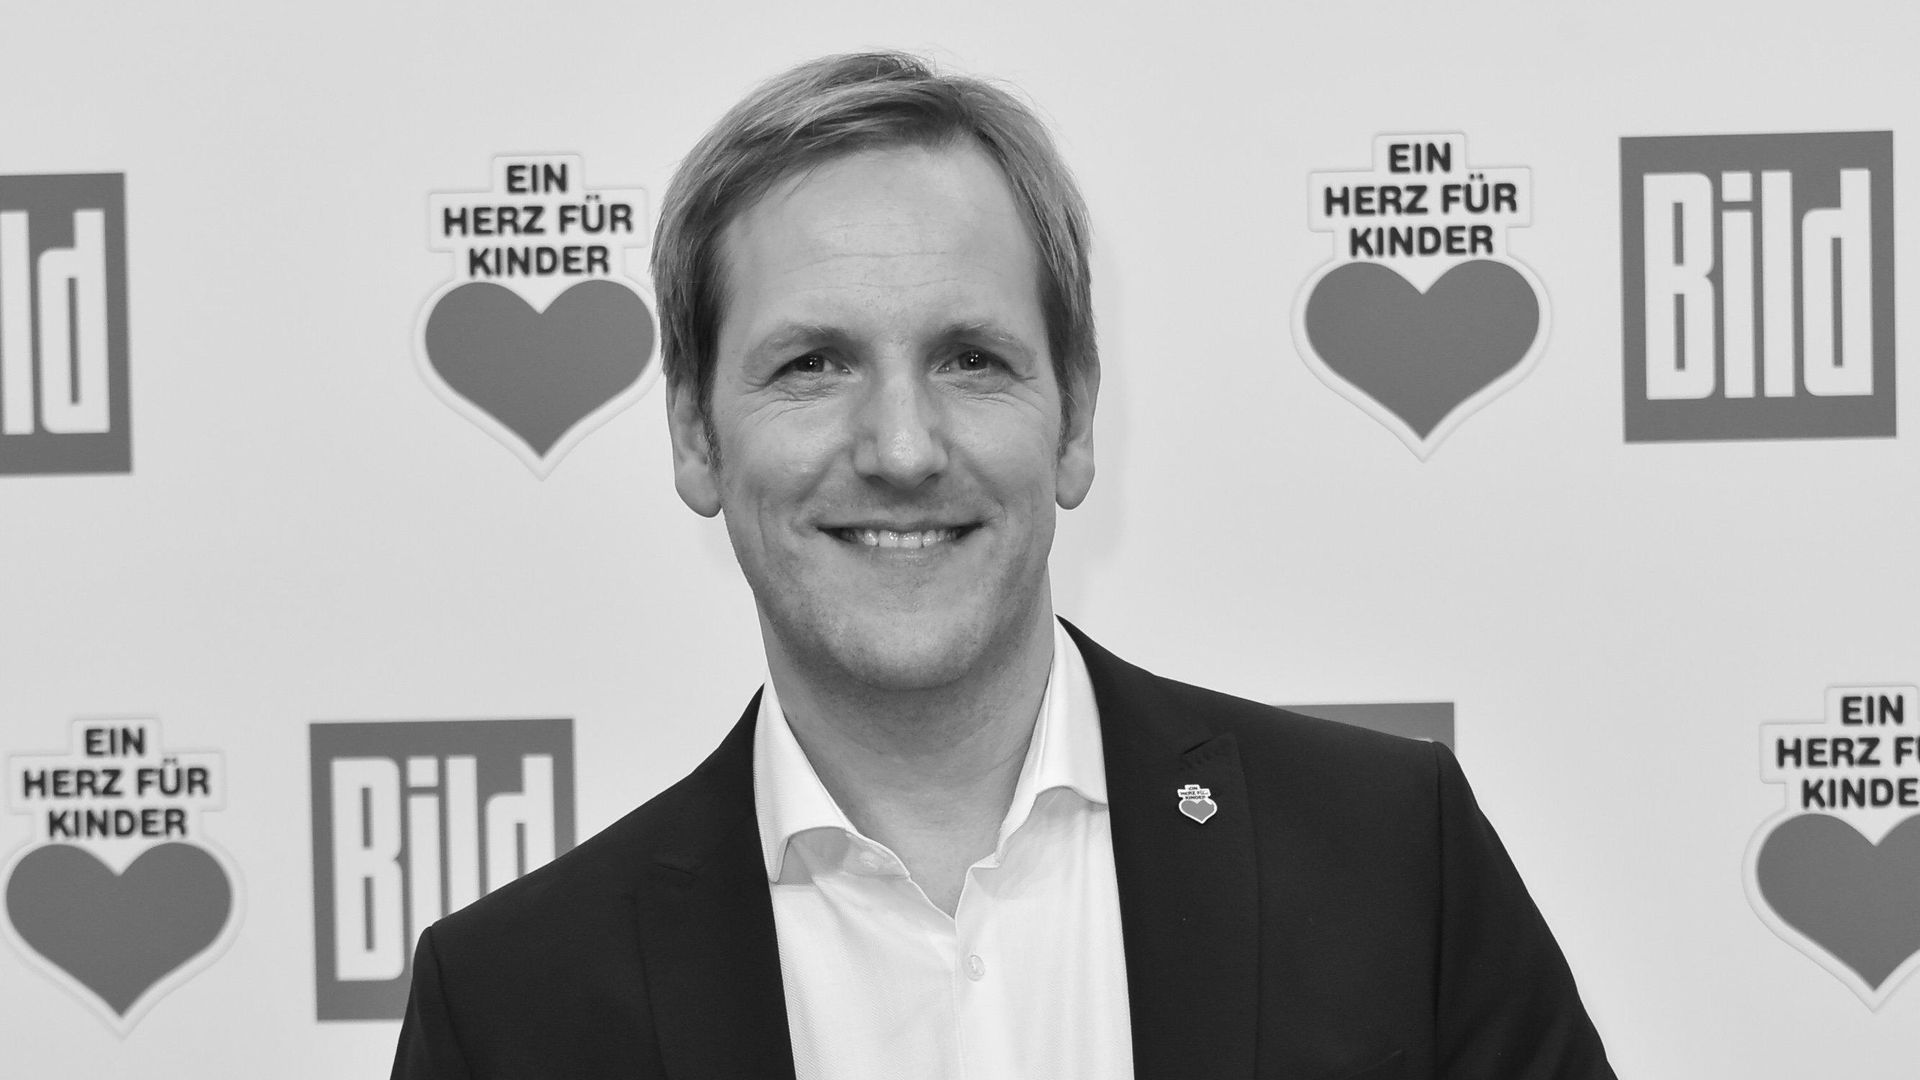 TV-Moderator Jan Hahn (†47) starb an Krebserkrankung